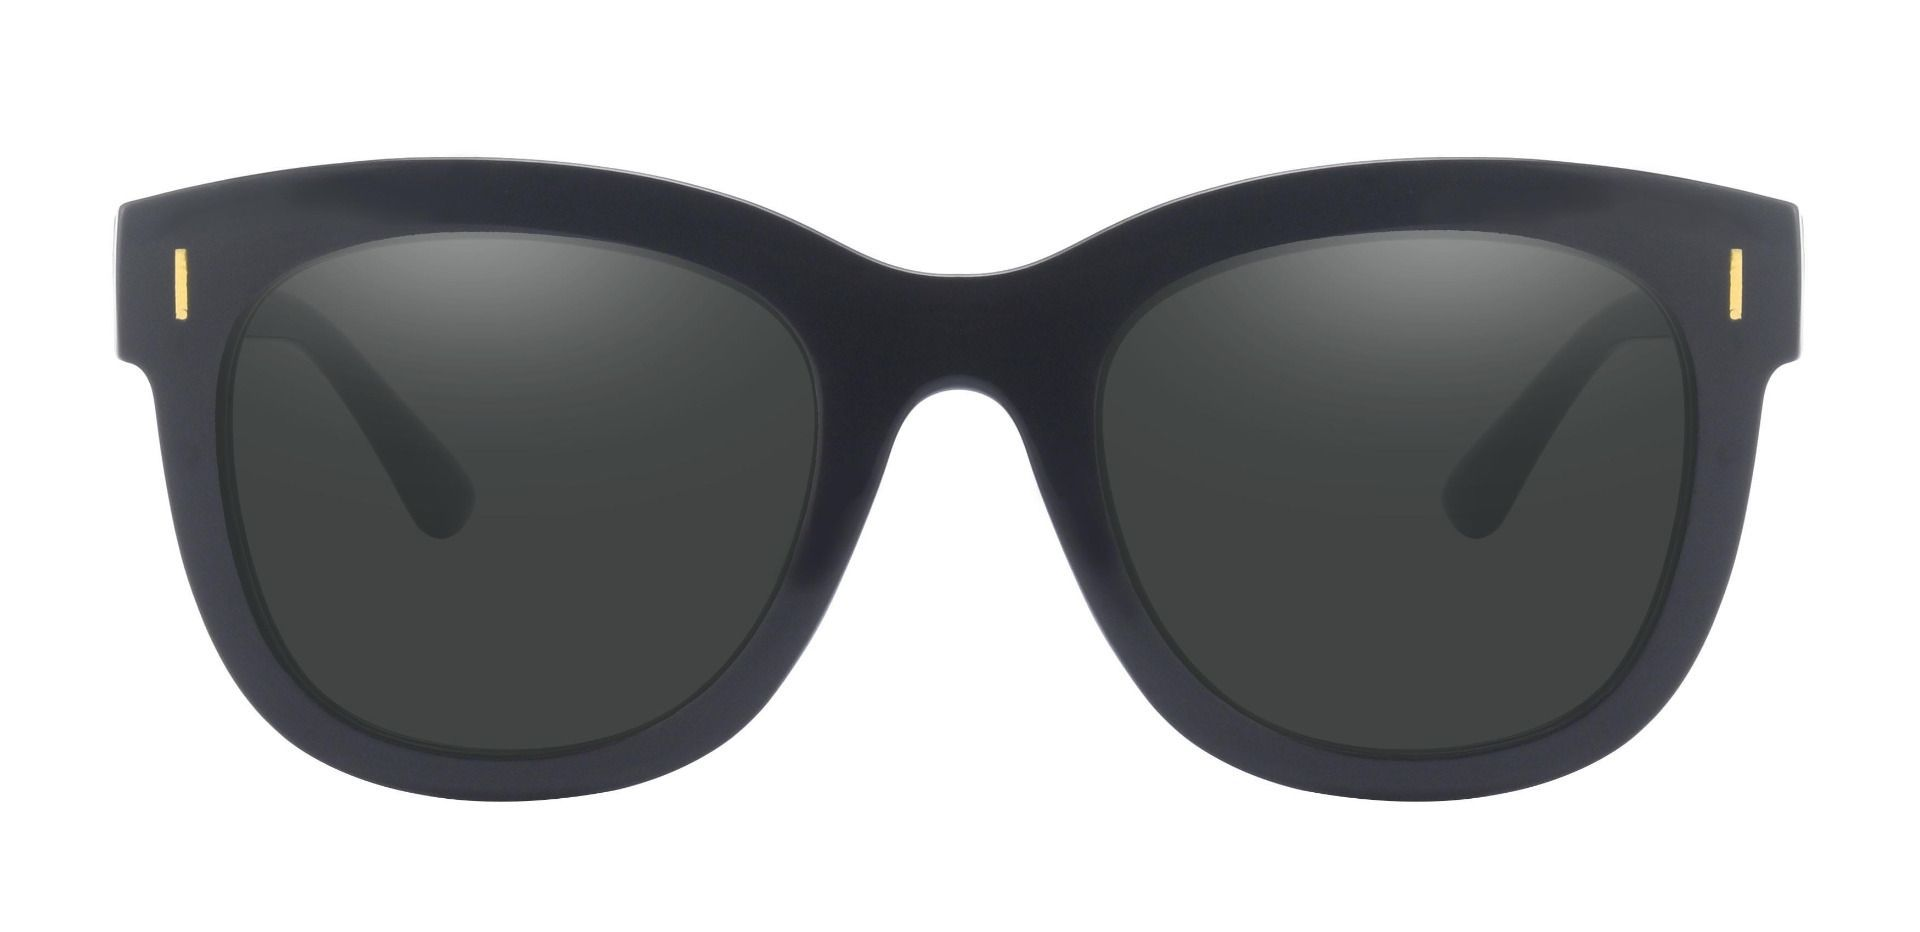 Saratoga Square Lined Bifocal Sunglasses - Black Frame With Gray Lenses